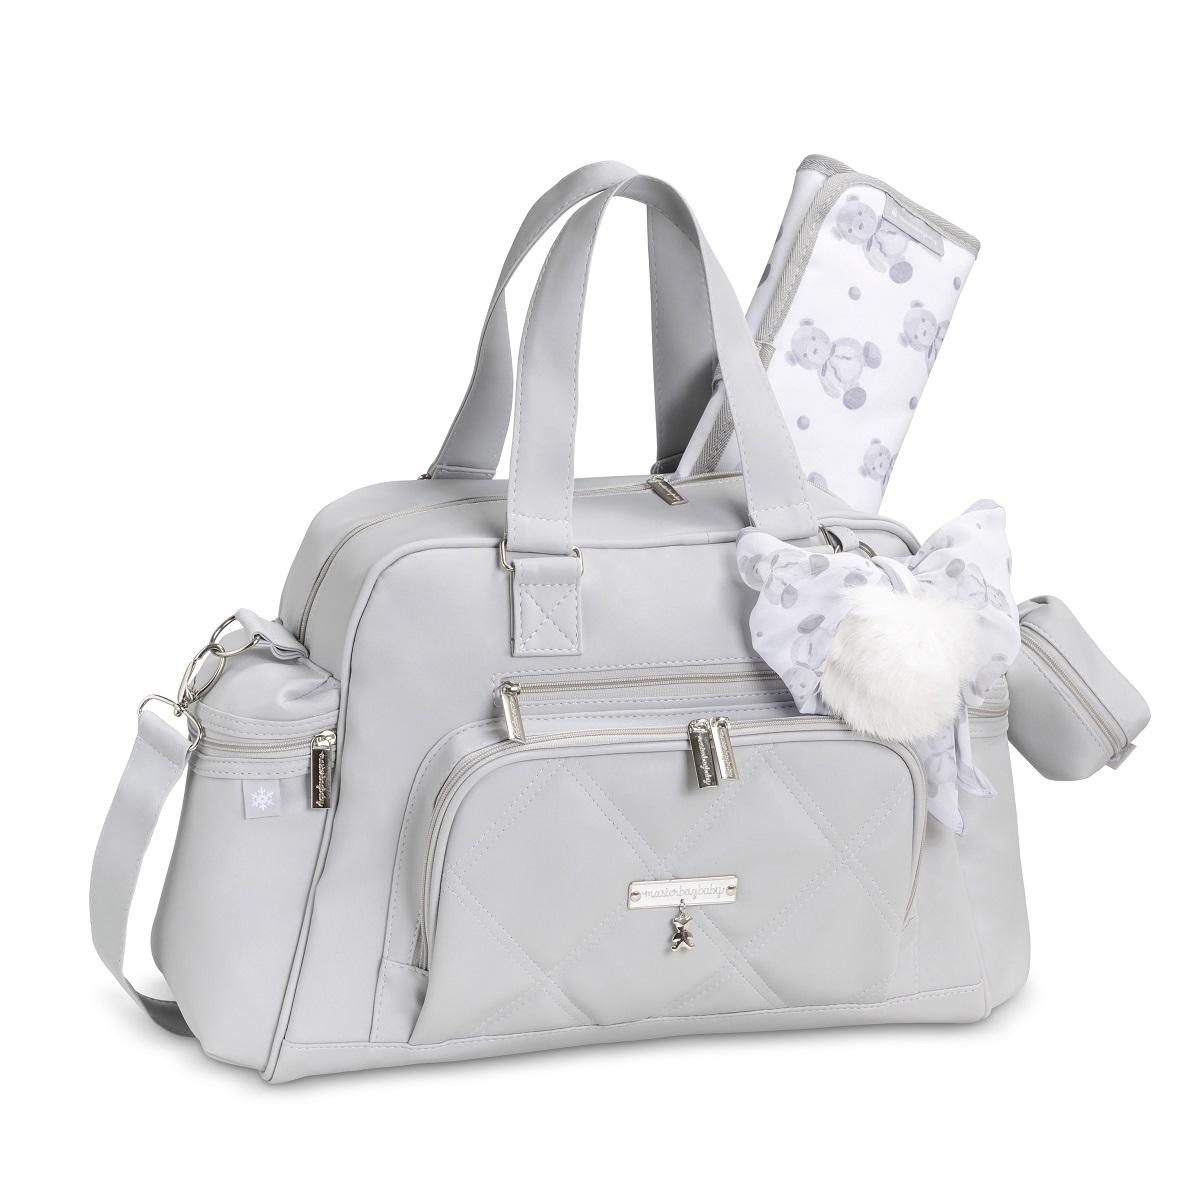 Bolsa maternidade térmica Everyday Urso Cinza - Masterbag Baby